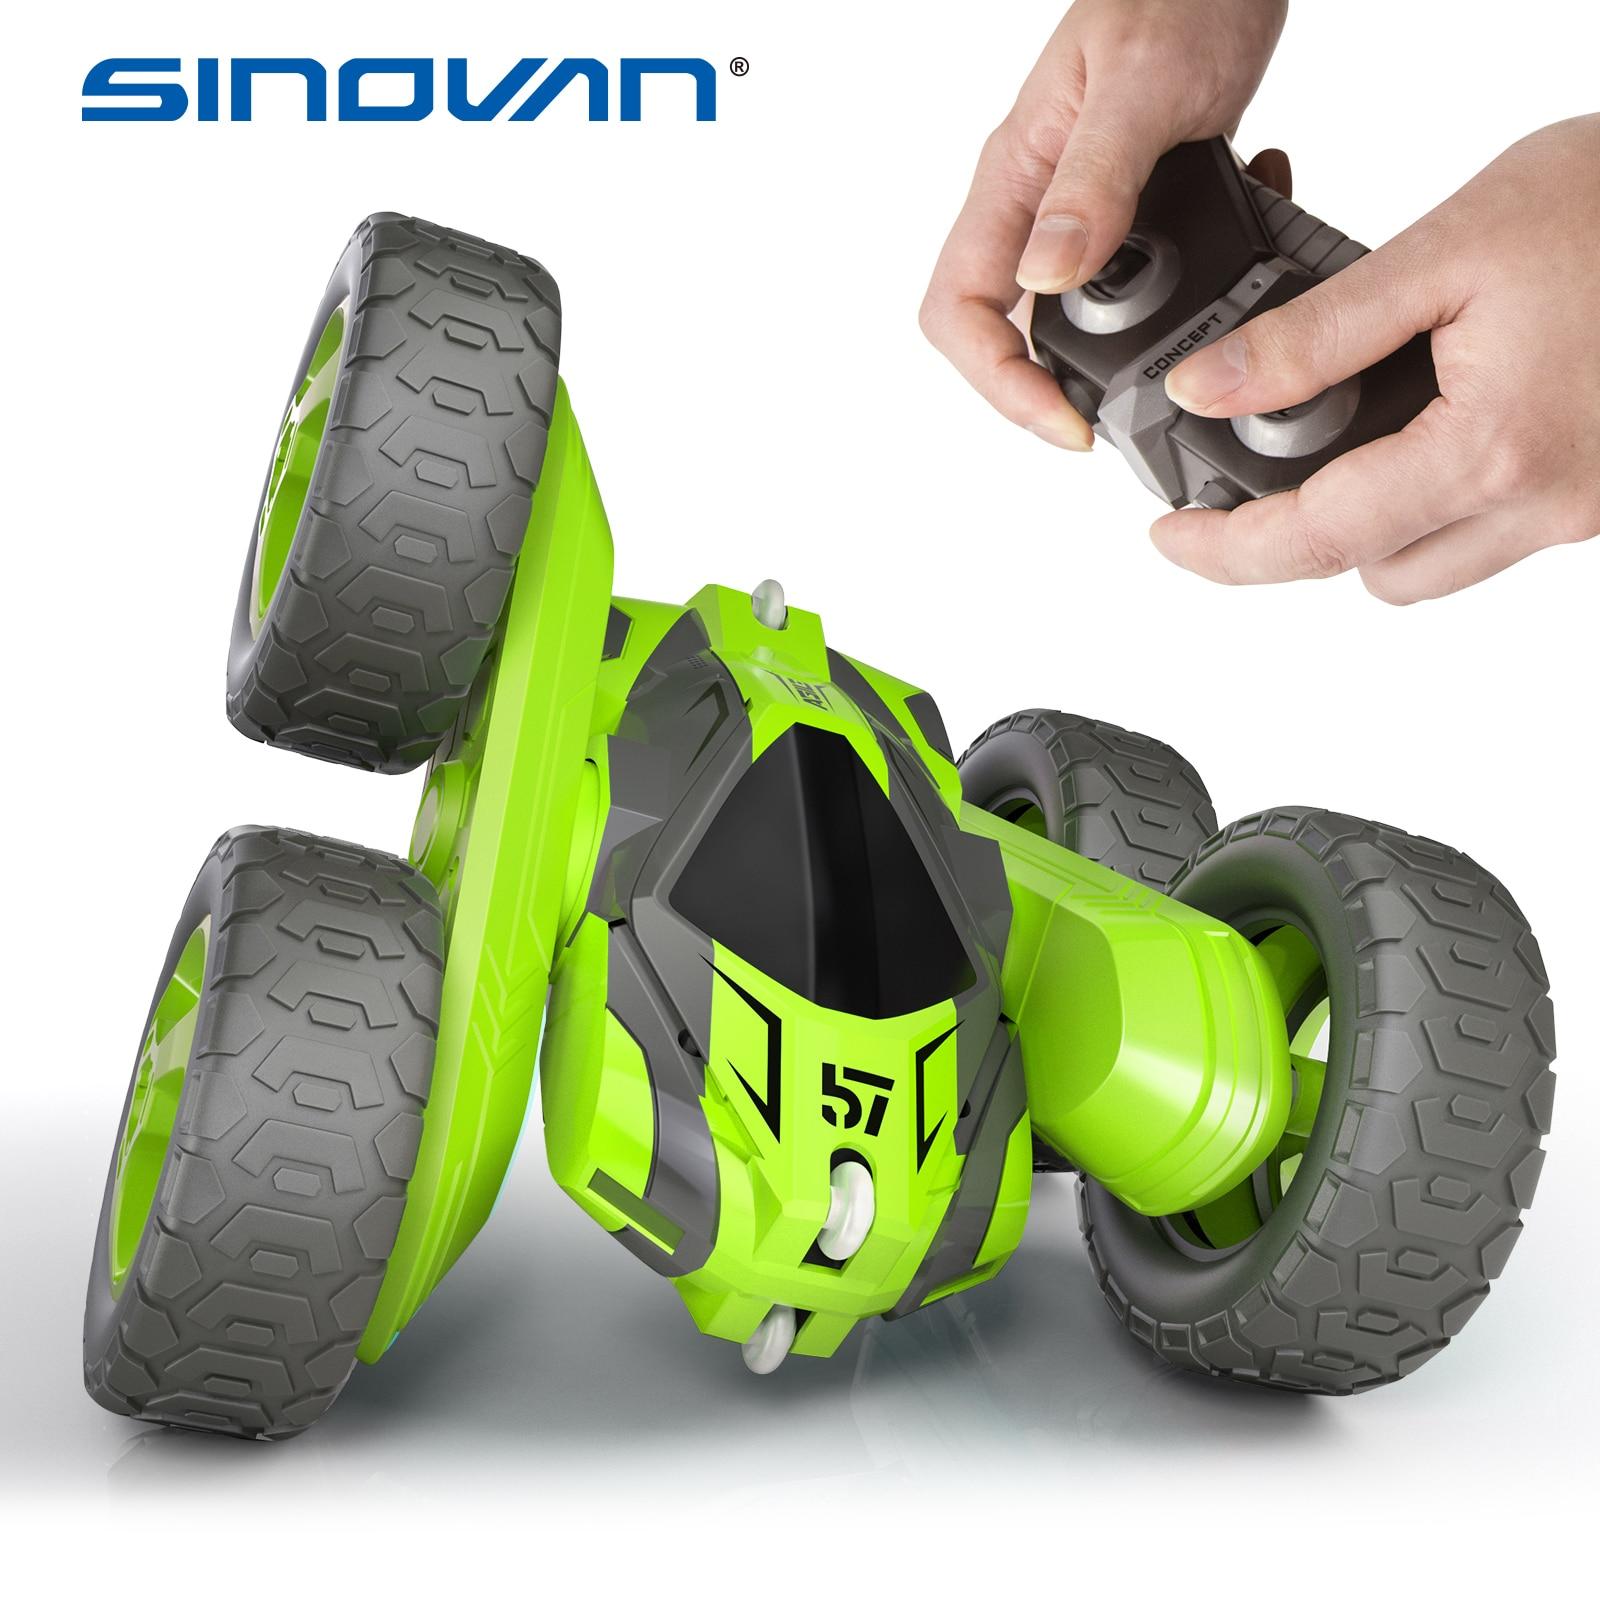 Sinovan RC трюк автомобиль 2,4G 4CH Дрифт деформации Багги ролл автомобиль флип 360 градусов вращающийся автомобиль модели дистанционного управлени...